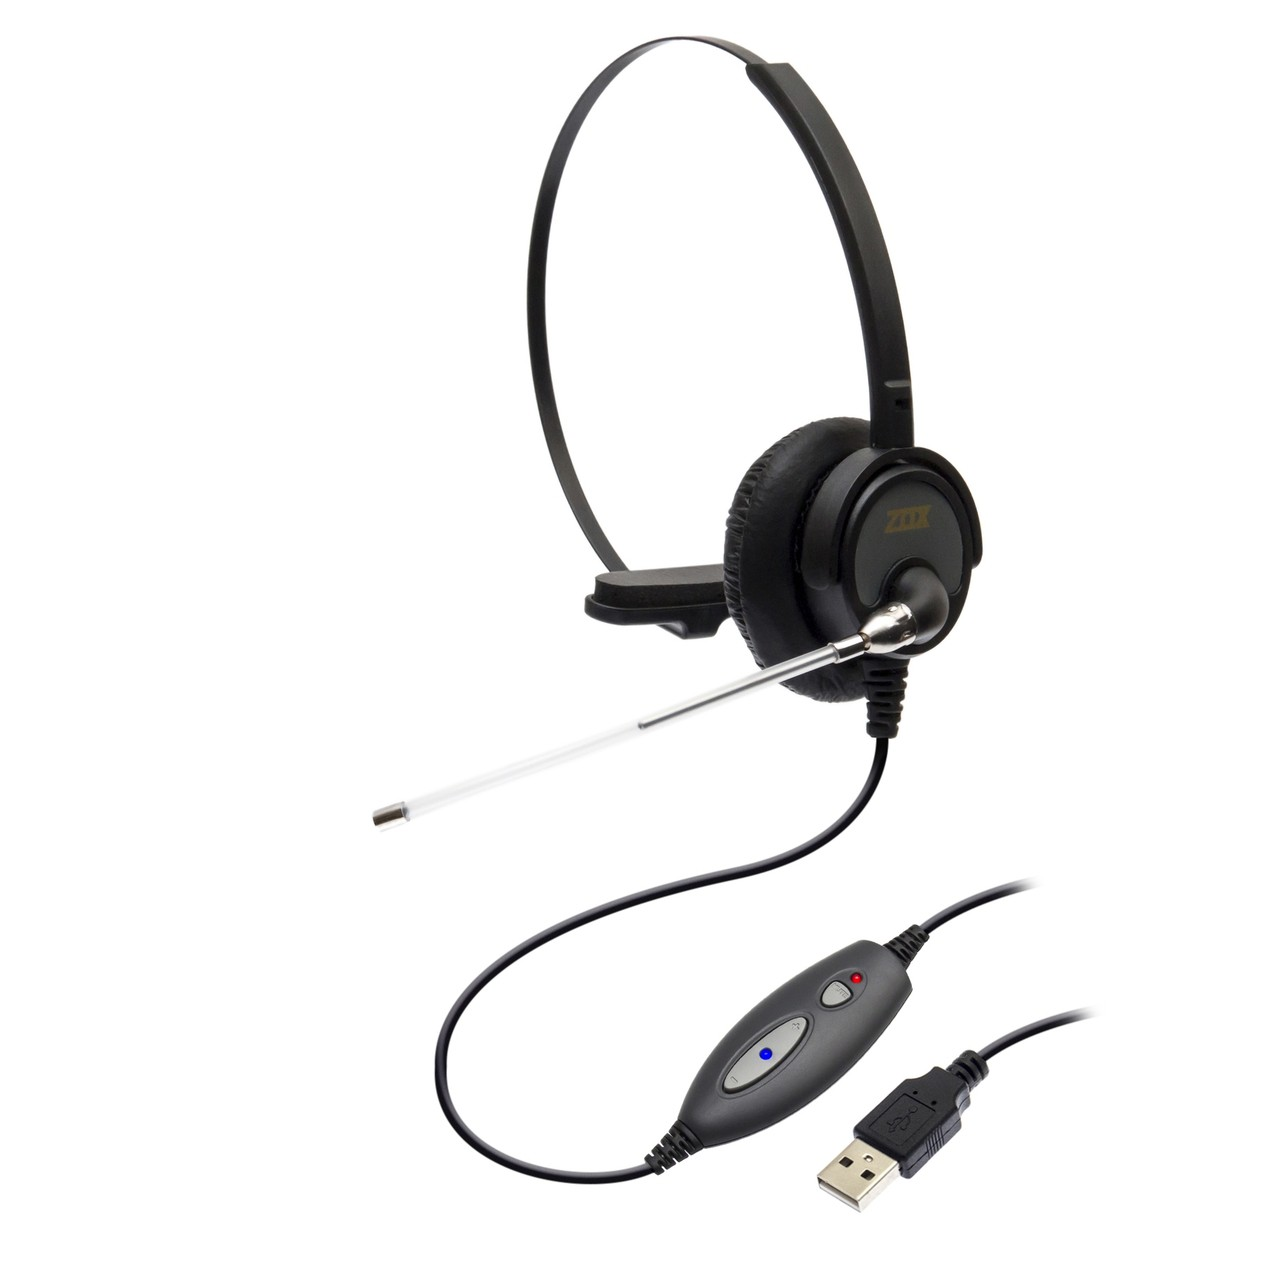 Headset USB DH-60T com Tubo de Voz - Zox